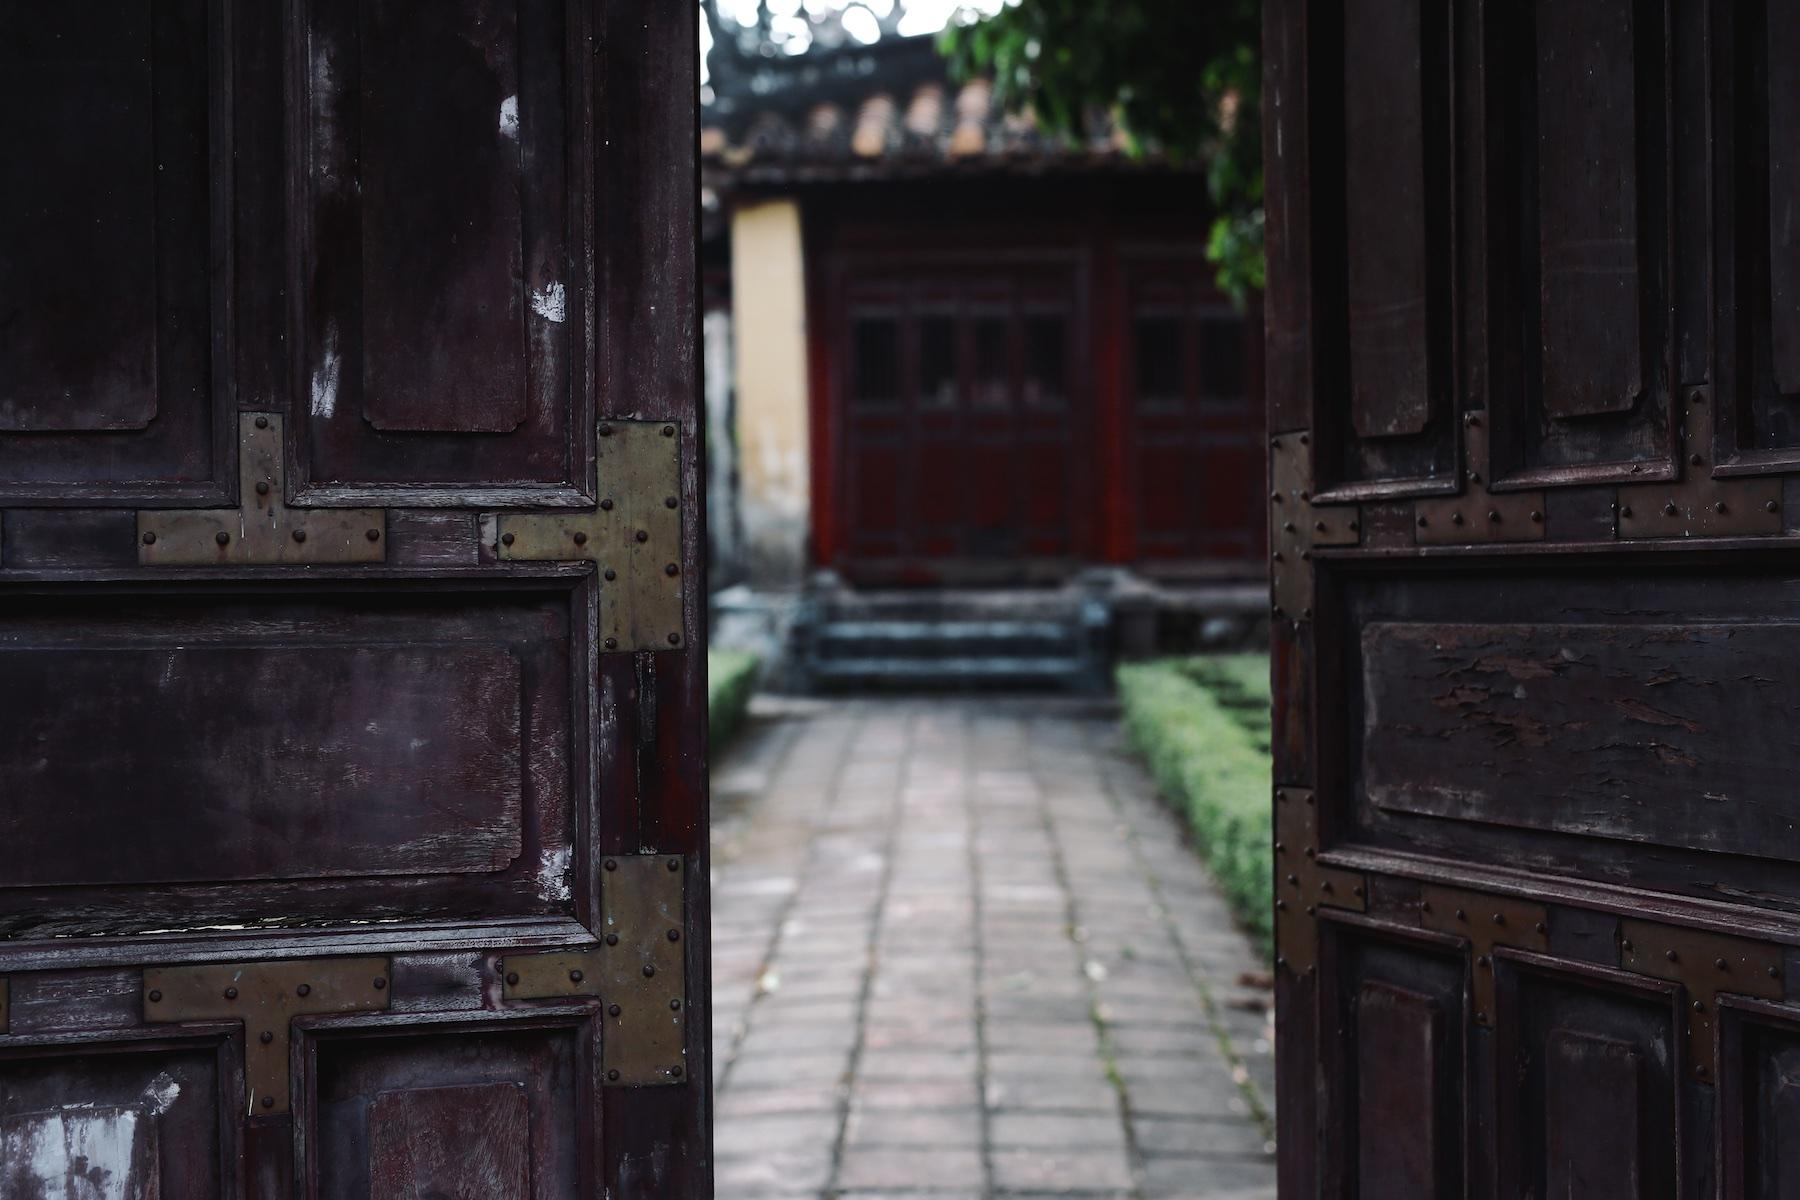 Imperial palace hue, vietnam, hue city, vietnam trip, asian architecture, travel photography